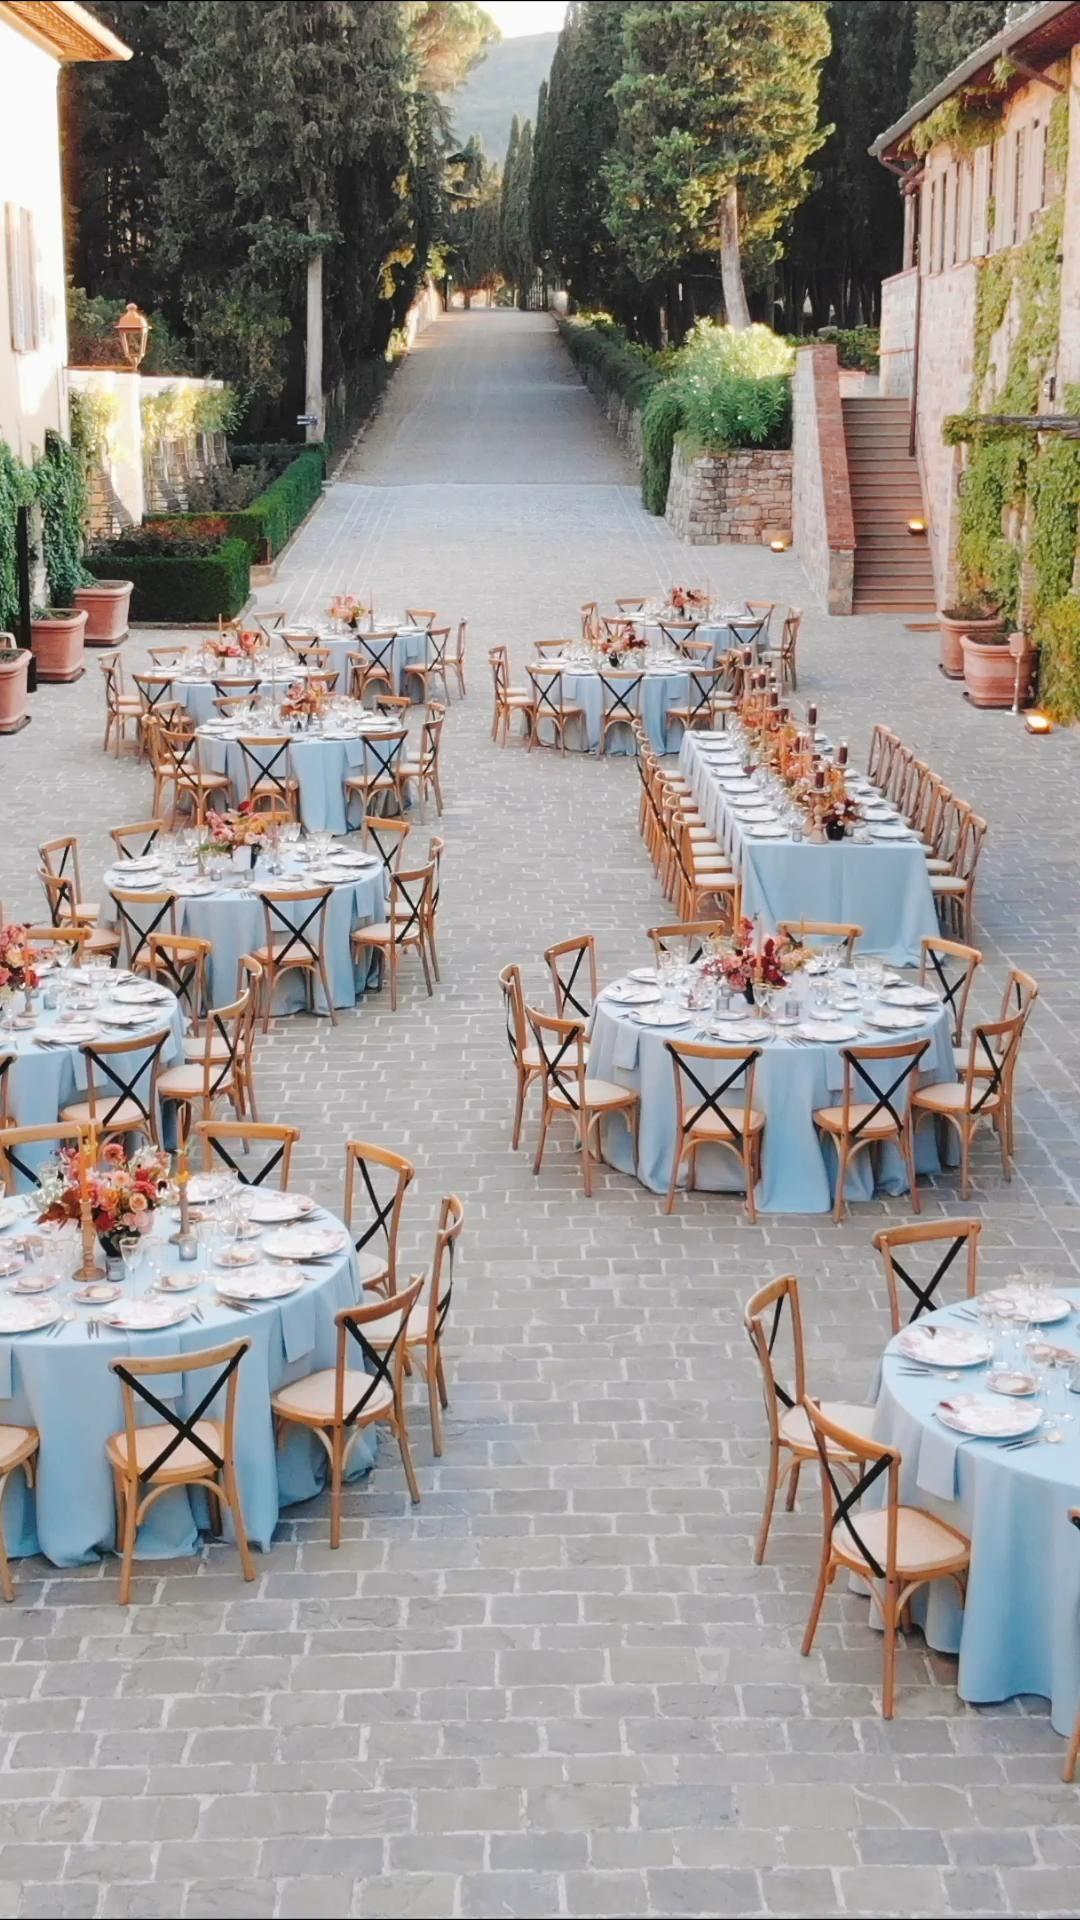 Stunning wedding reception at Castiglion del Bosco